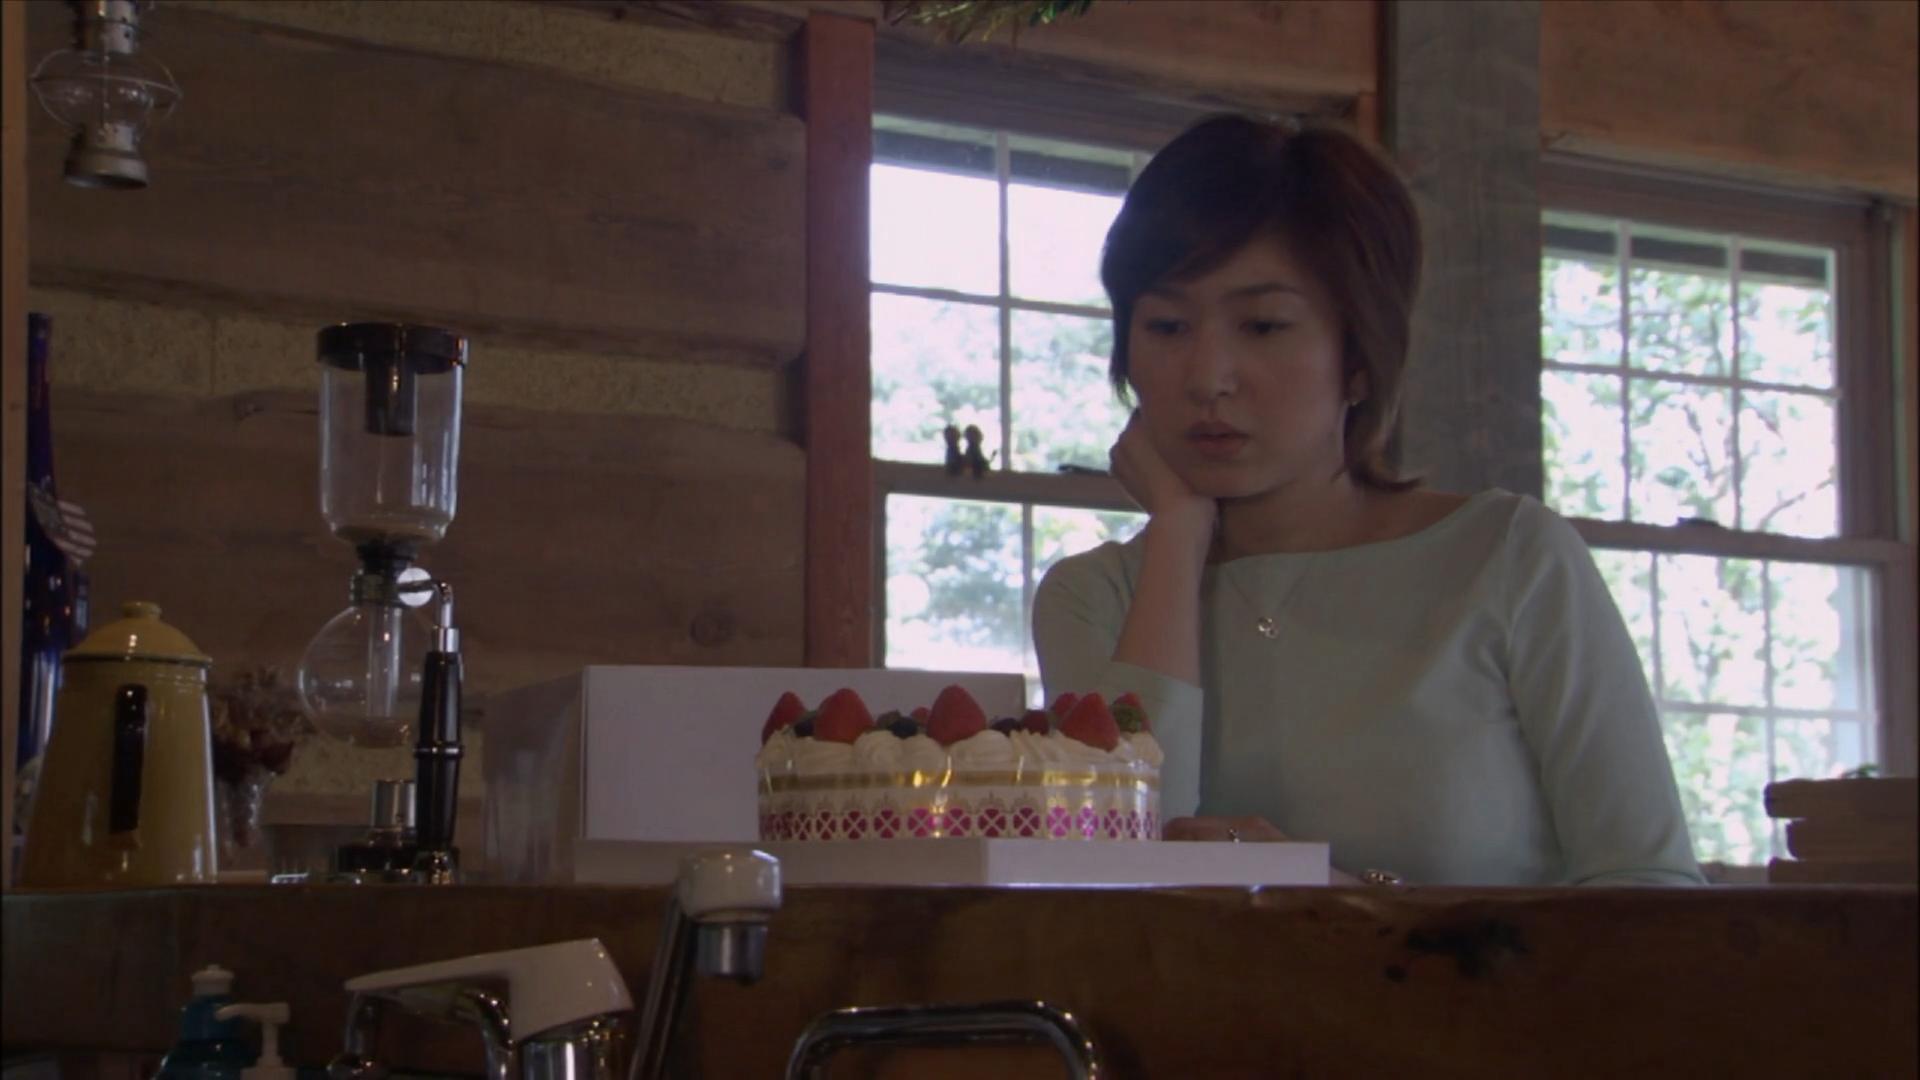 Haruka Kurihara/Missing Ace